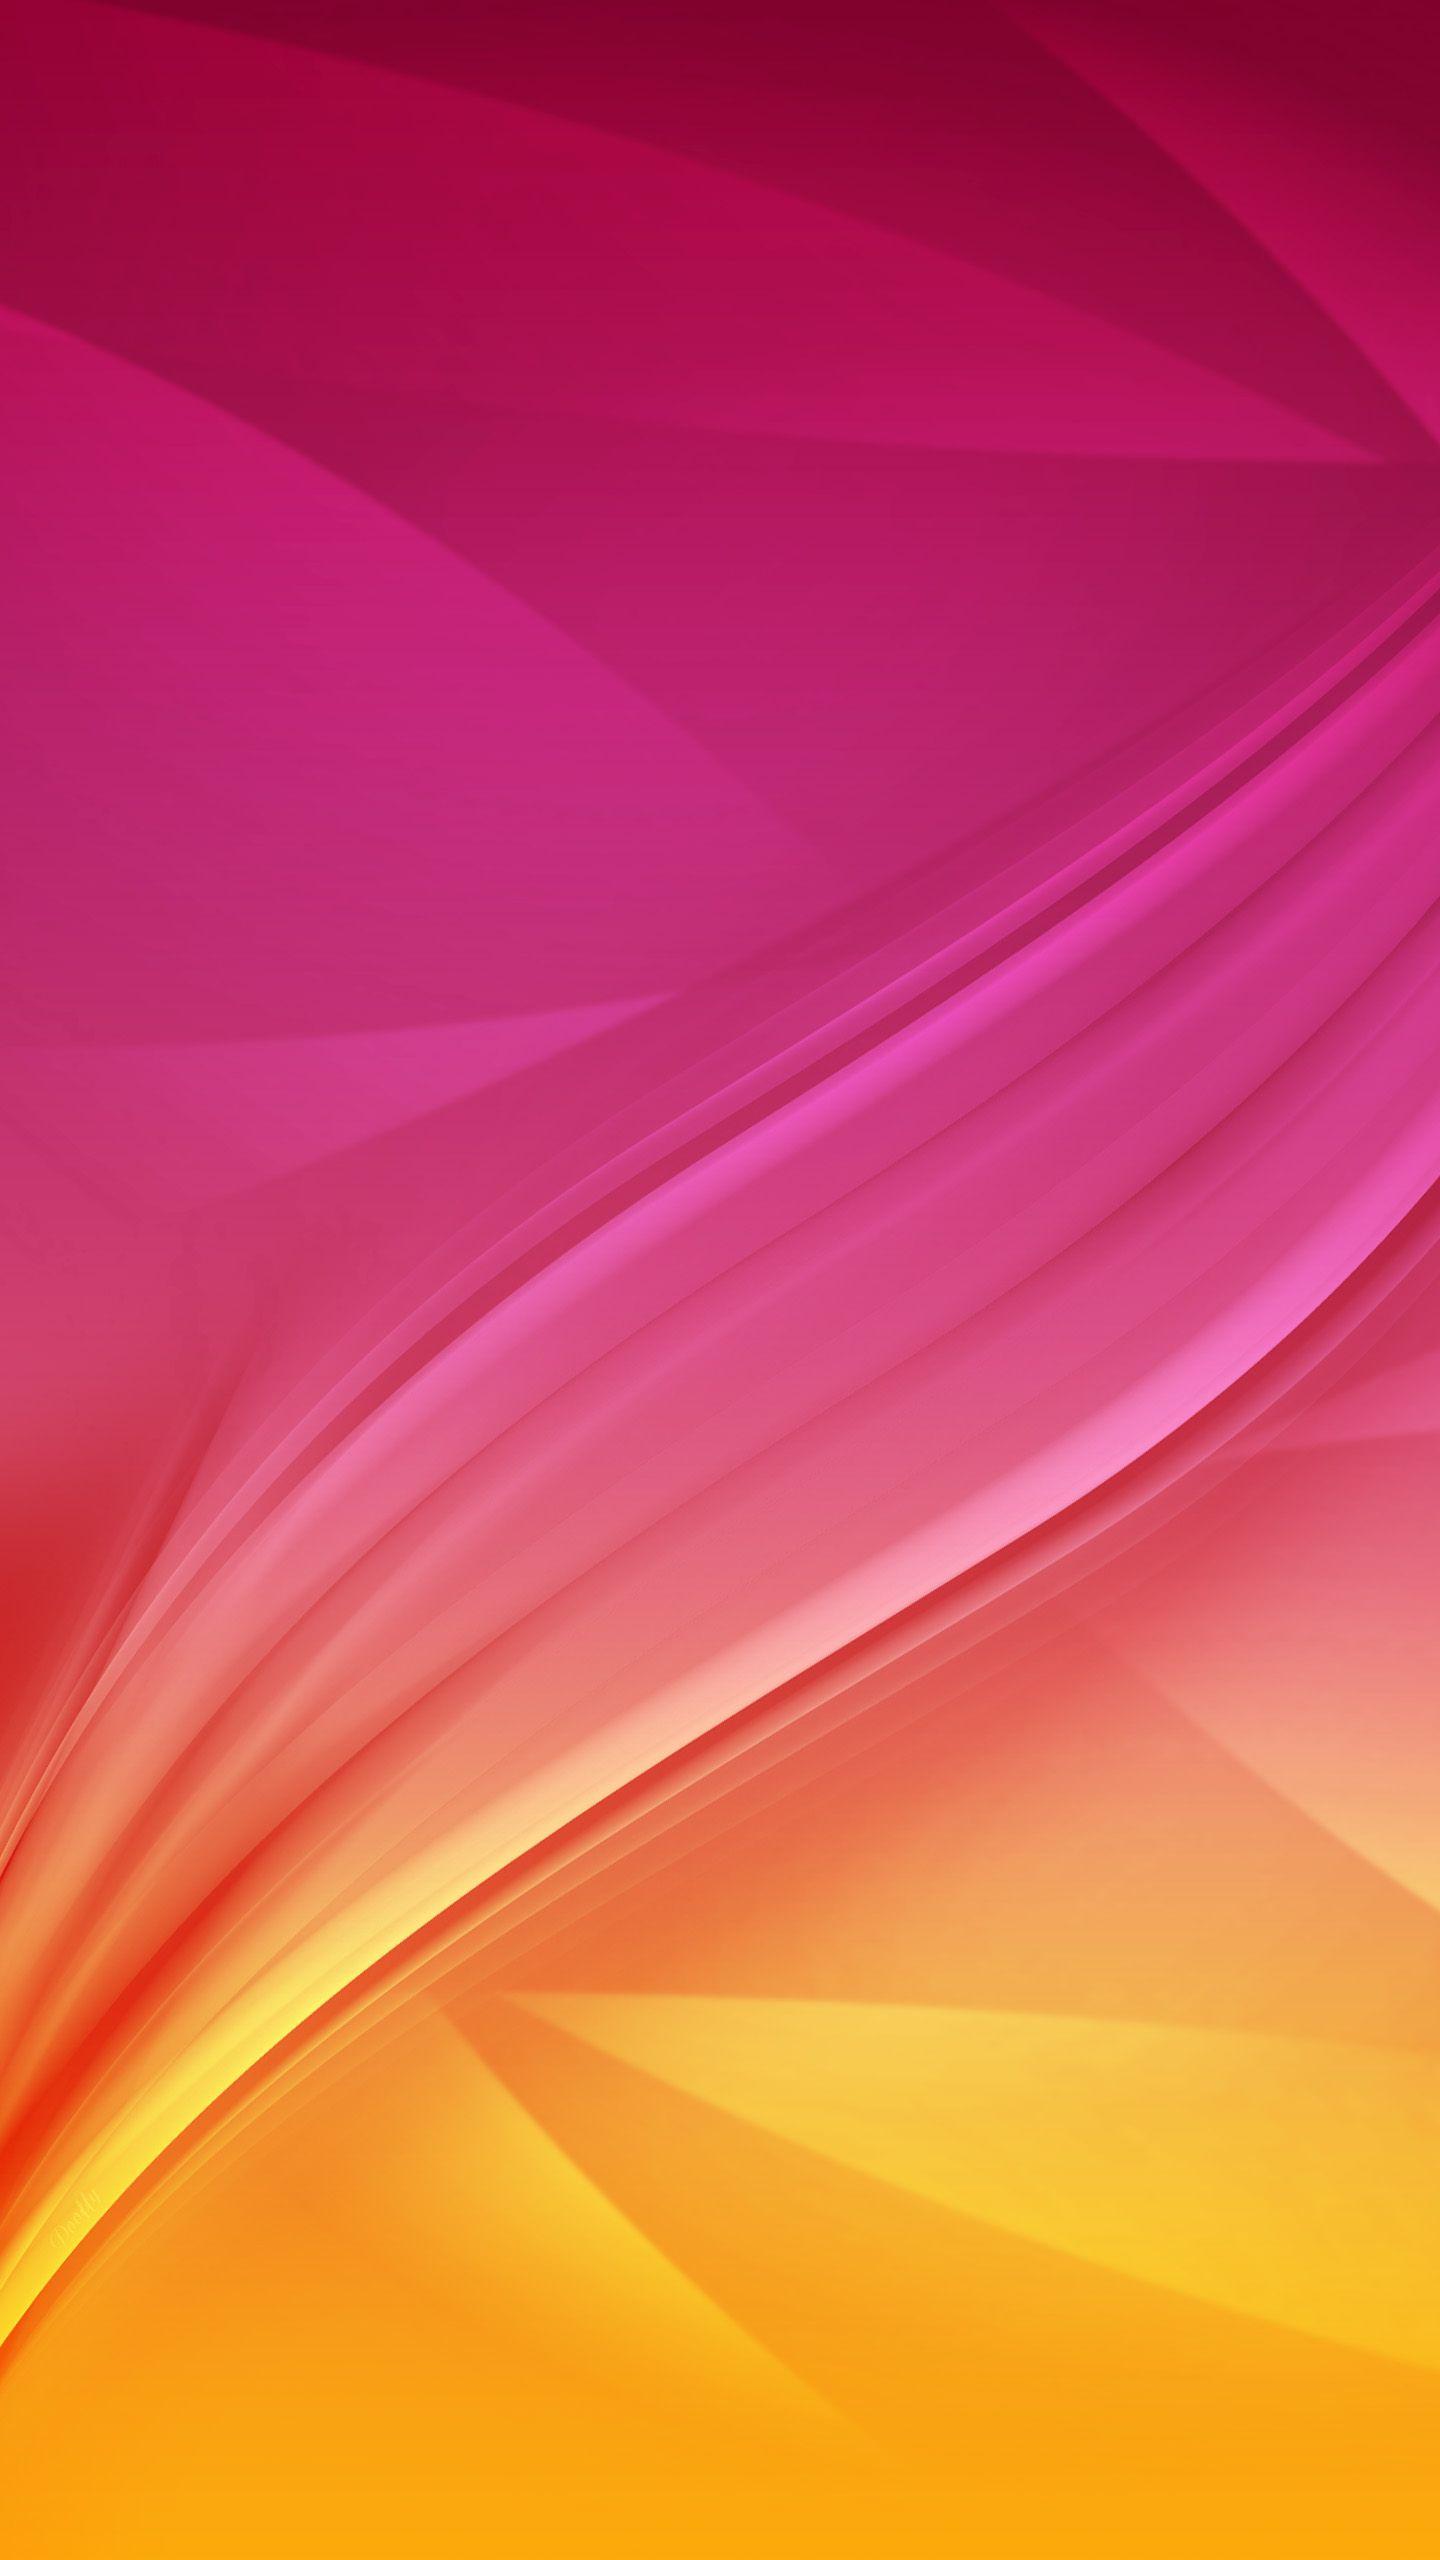 Hd wallpaper samsung galaxy s8 - Wallpaper Samsung Galaxy Colours By Dooffy By Dooffy Design